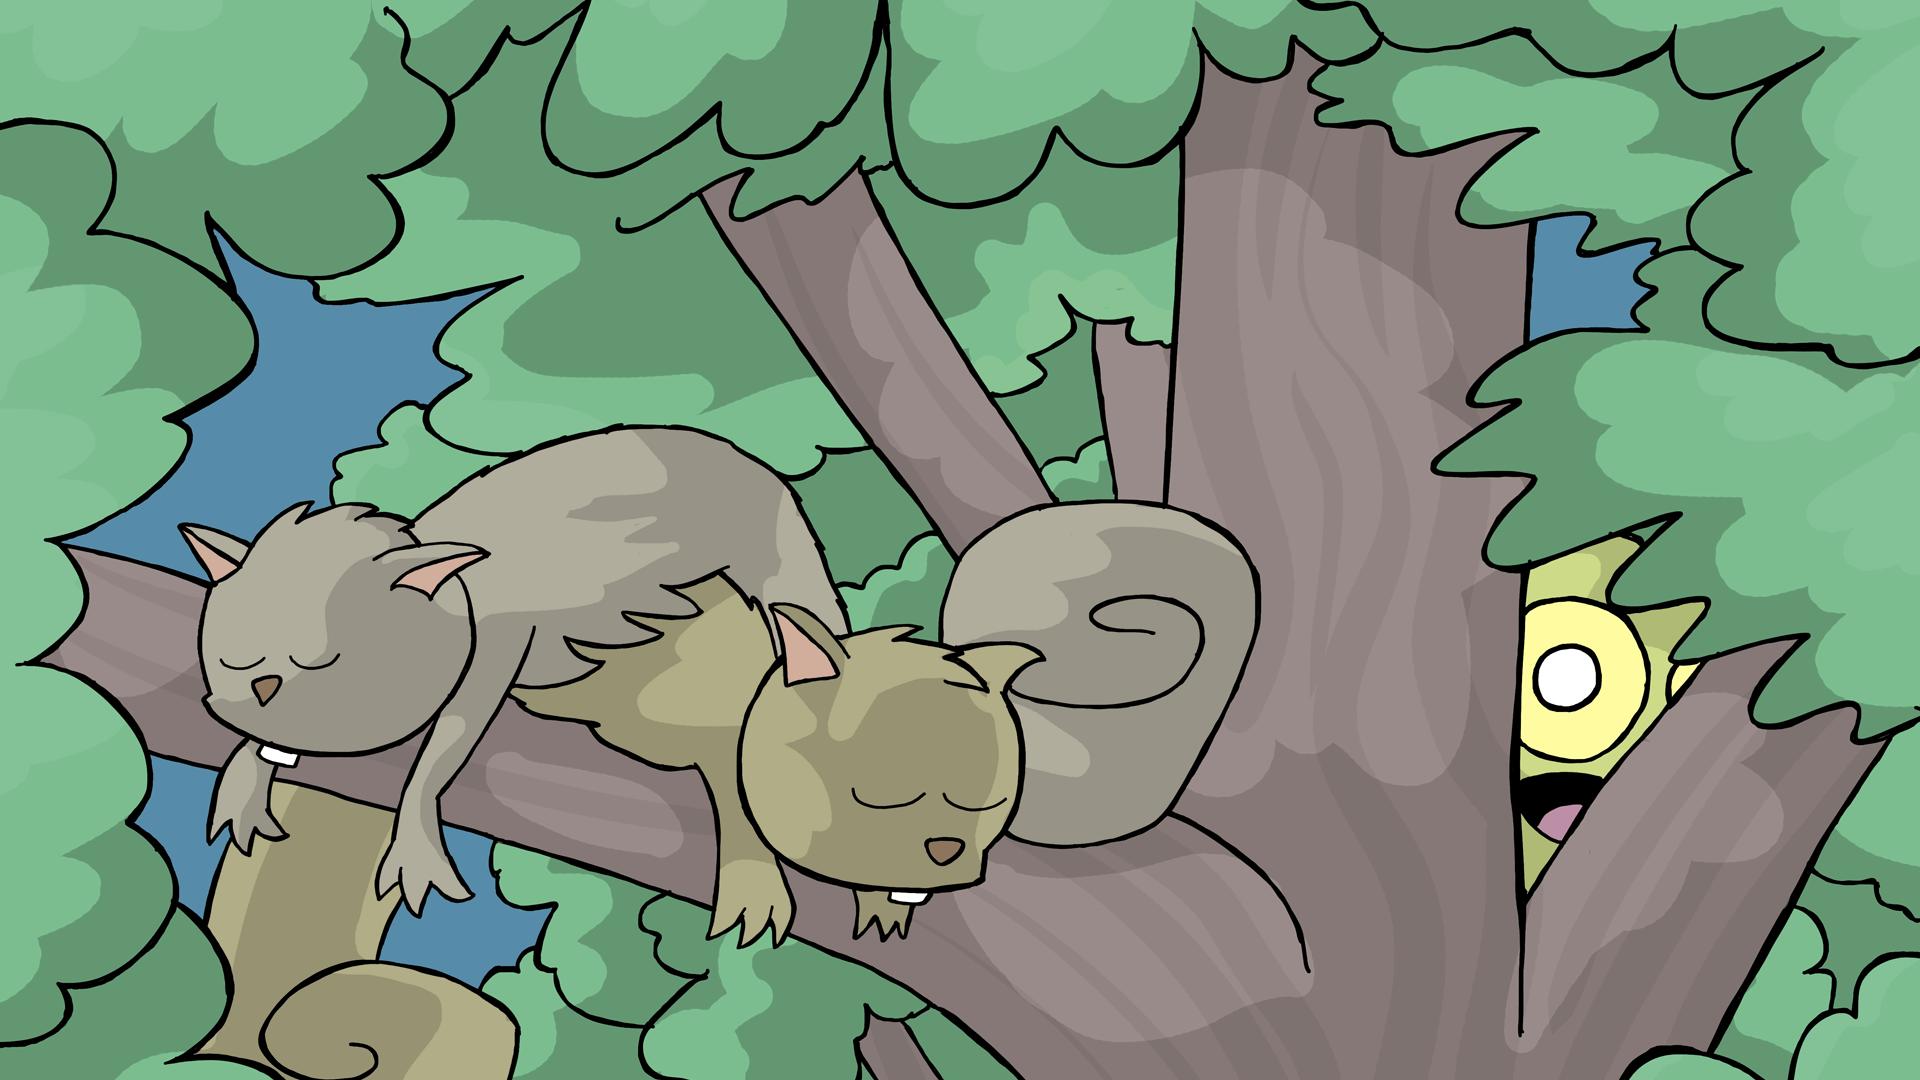 squirlzzz.png